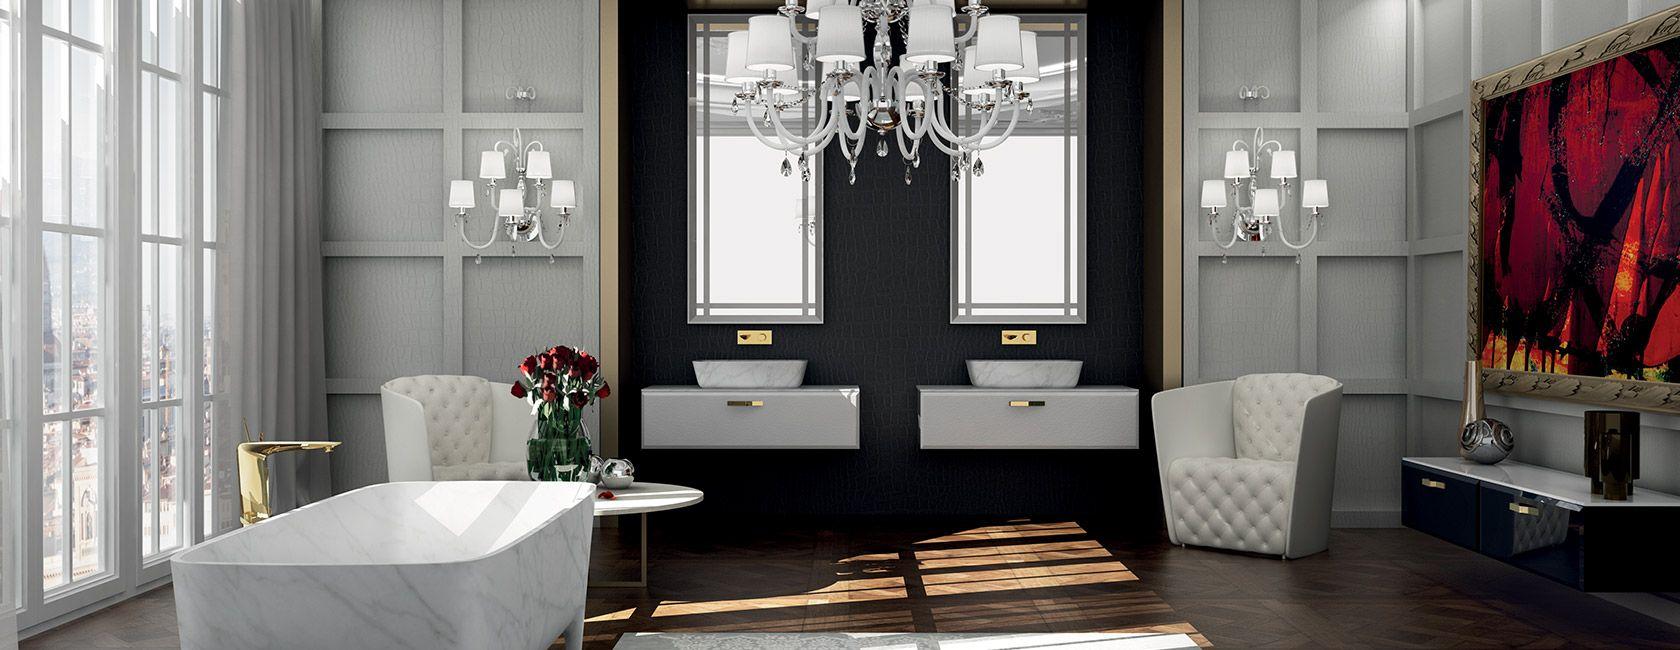 Poltrone e chandelier bagno - TEUCO | Arredo bagno | Pinterest ...